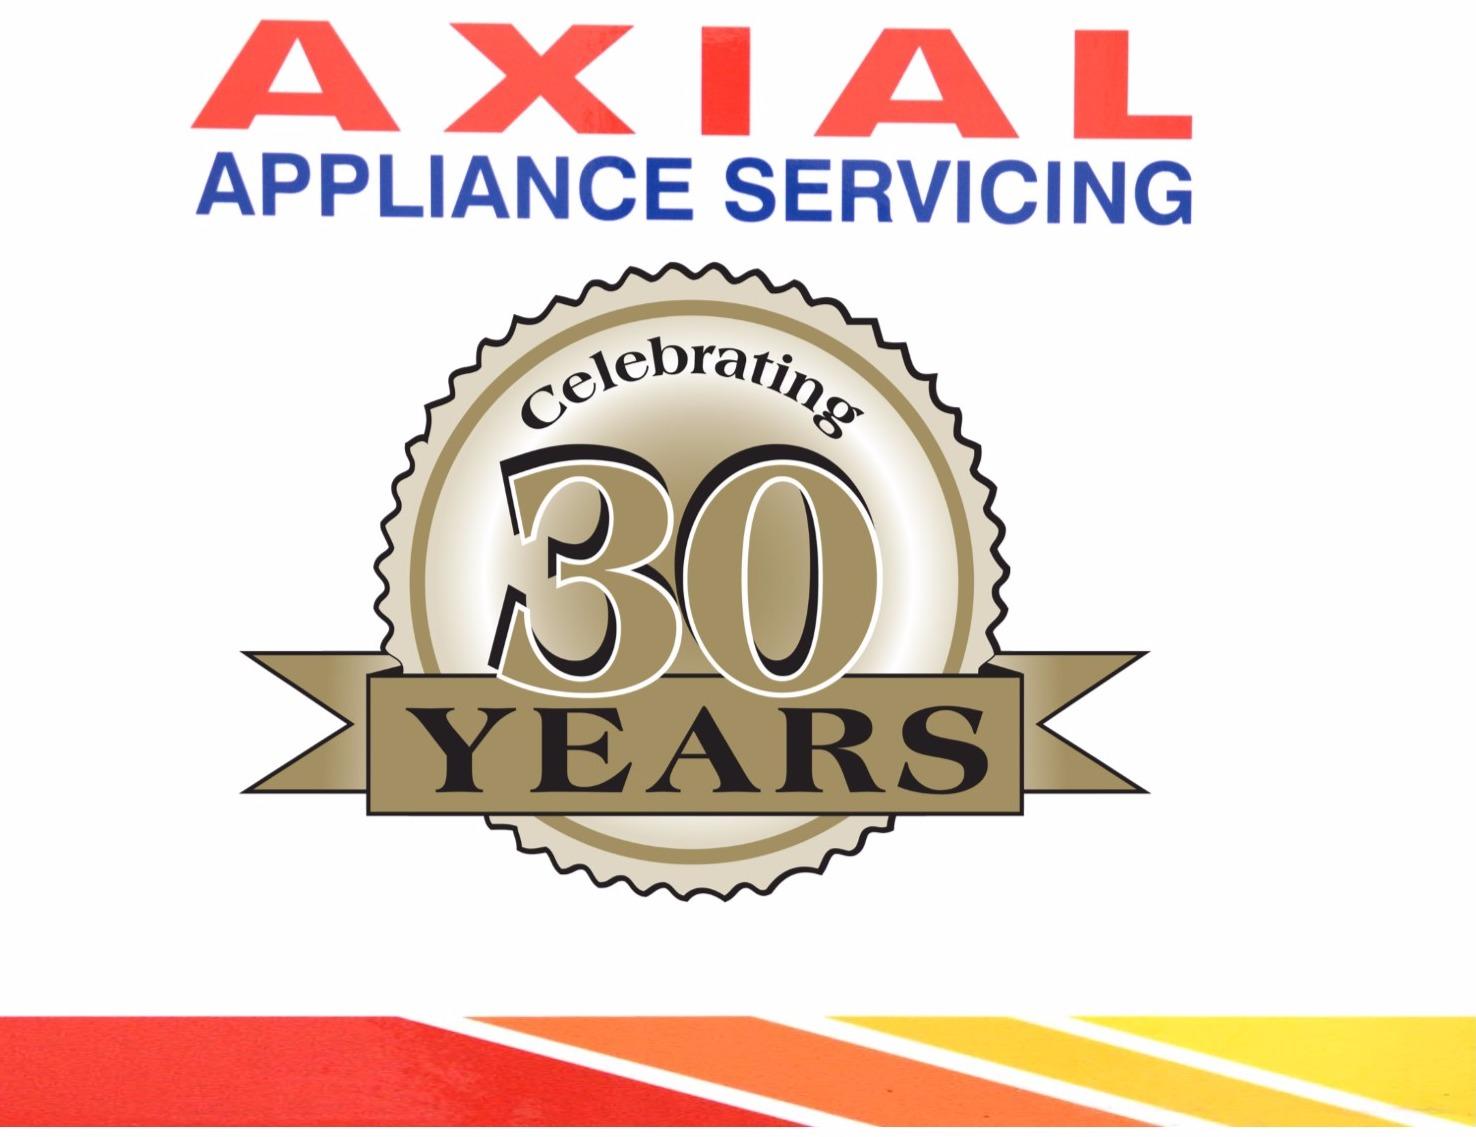 Axial Appliance Servicing Ltd